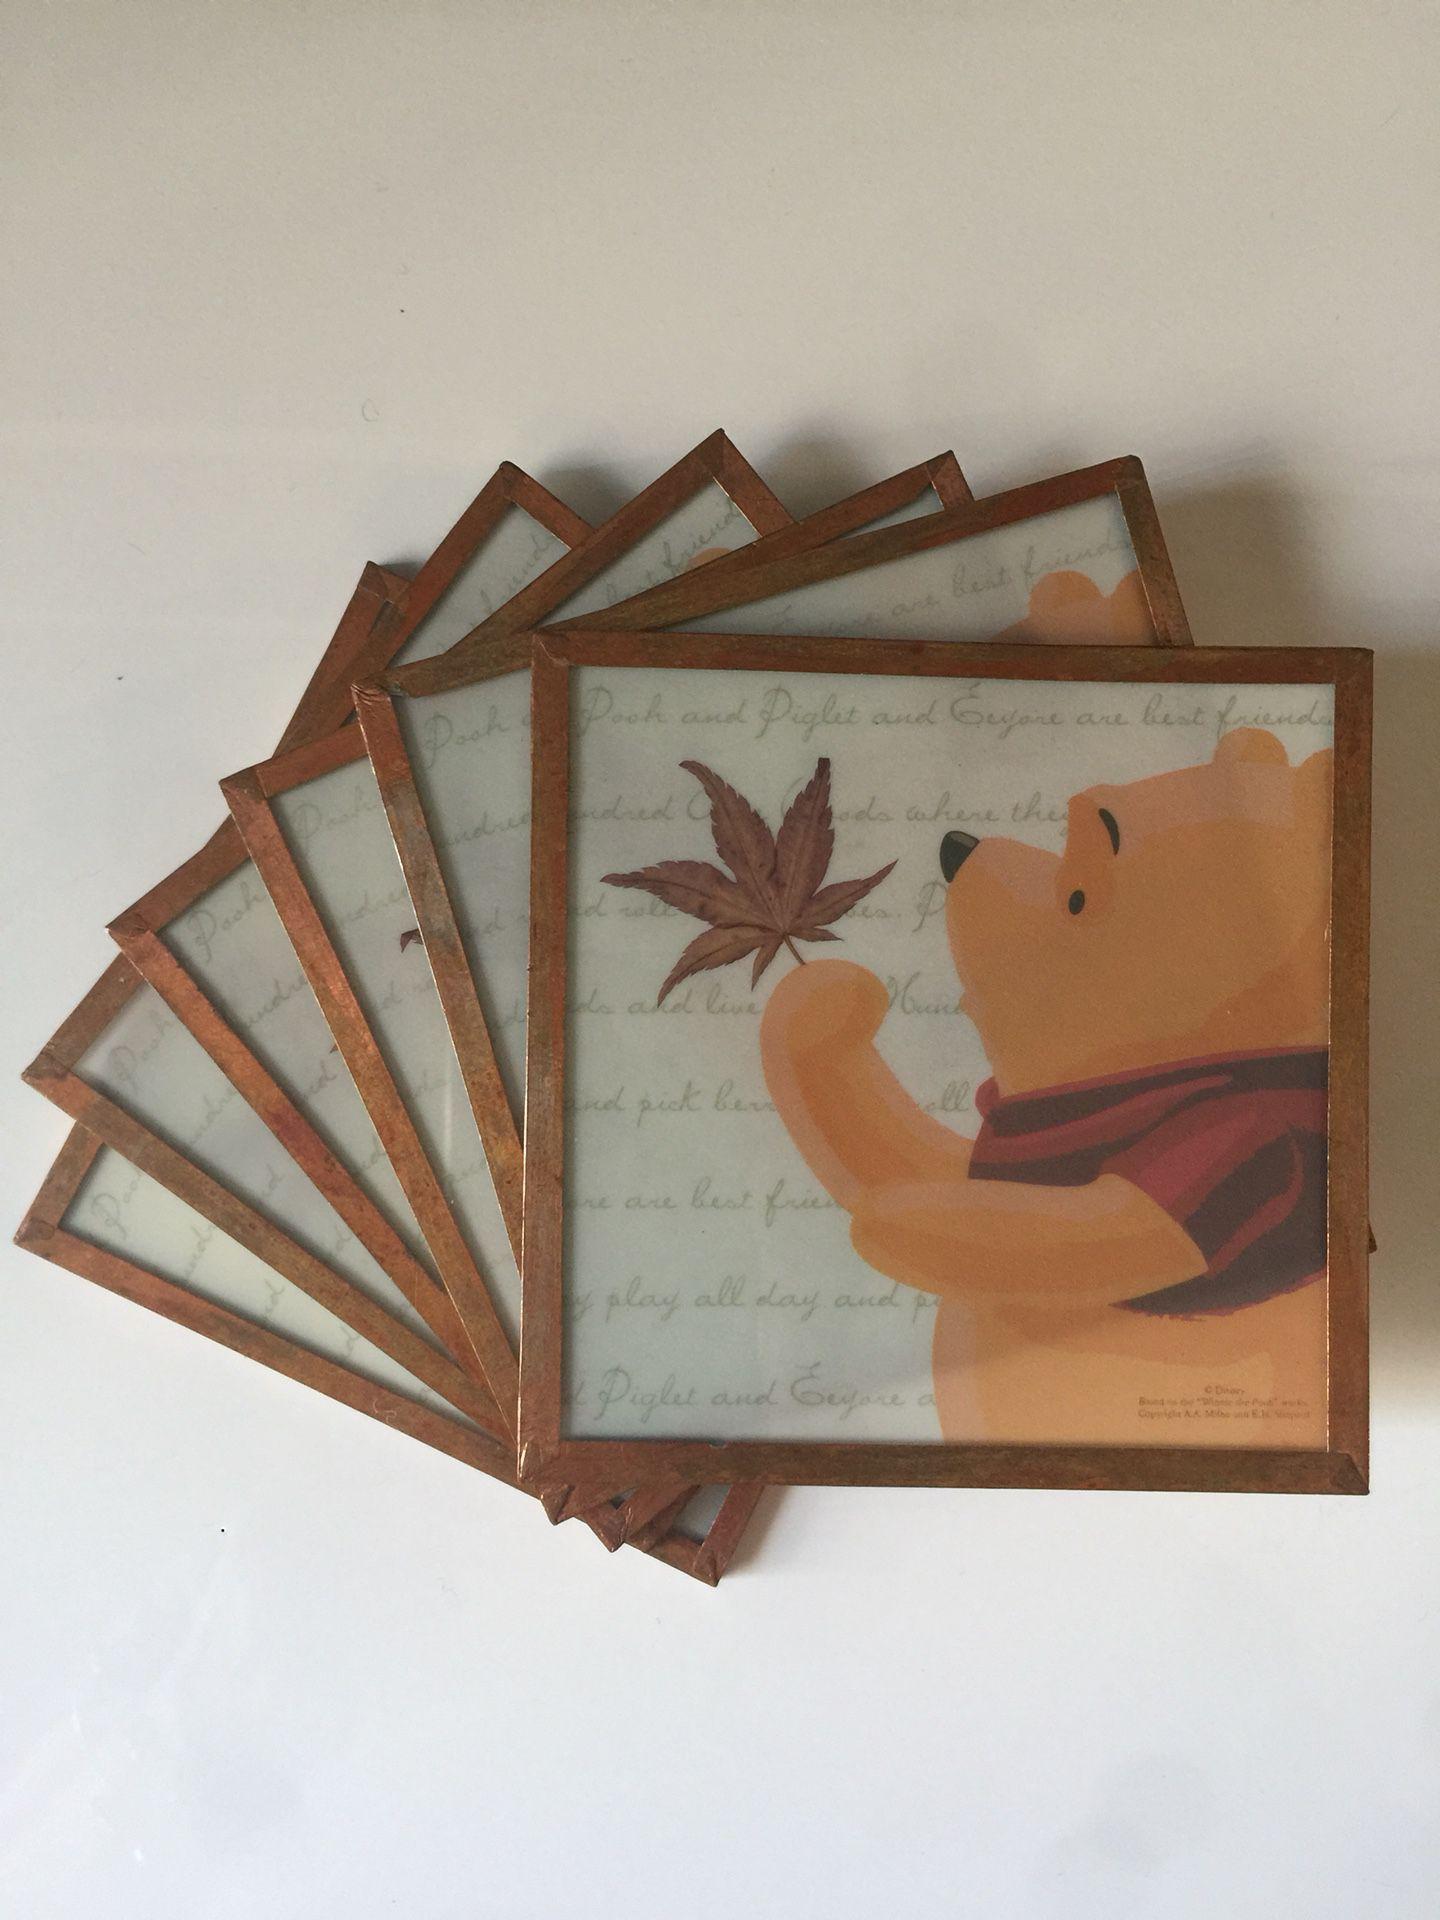 Fall / Autumn Decor - Framed Glass Winnie the Pooh Coasters/ Tile Set